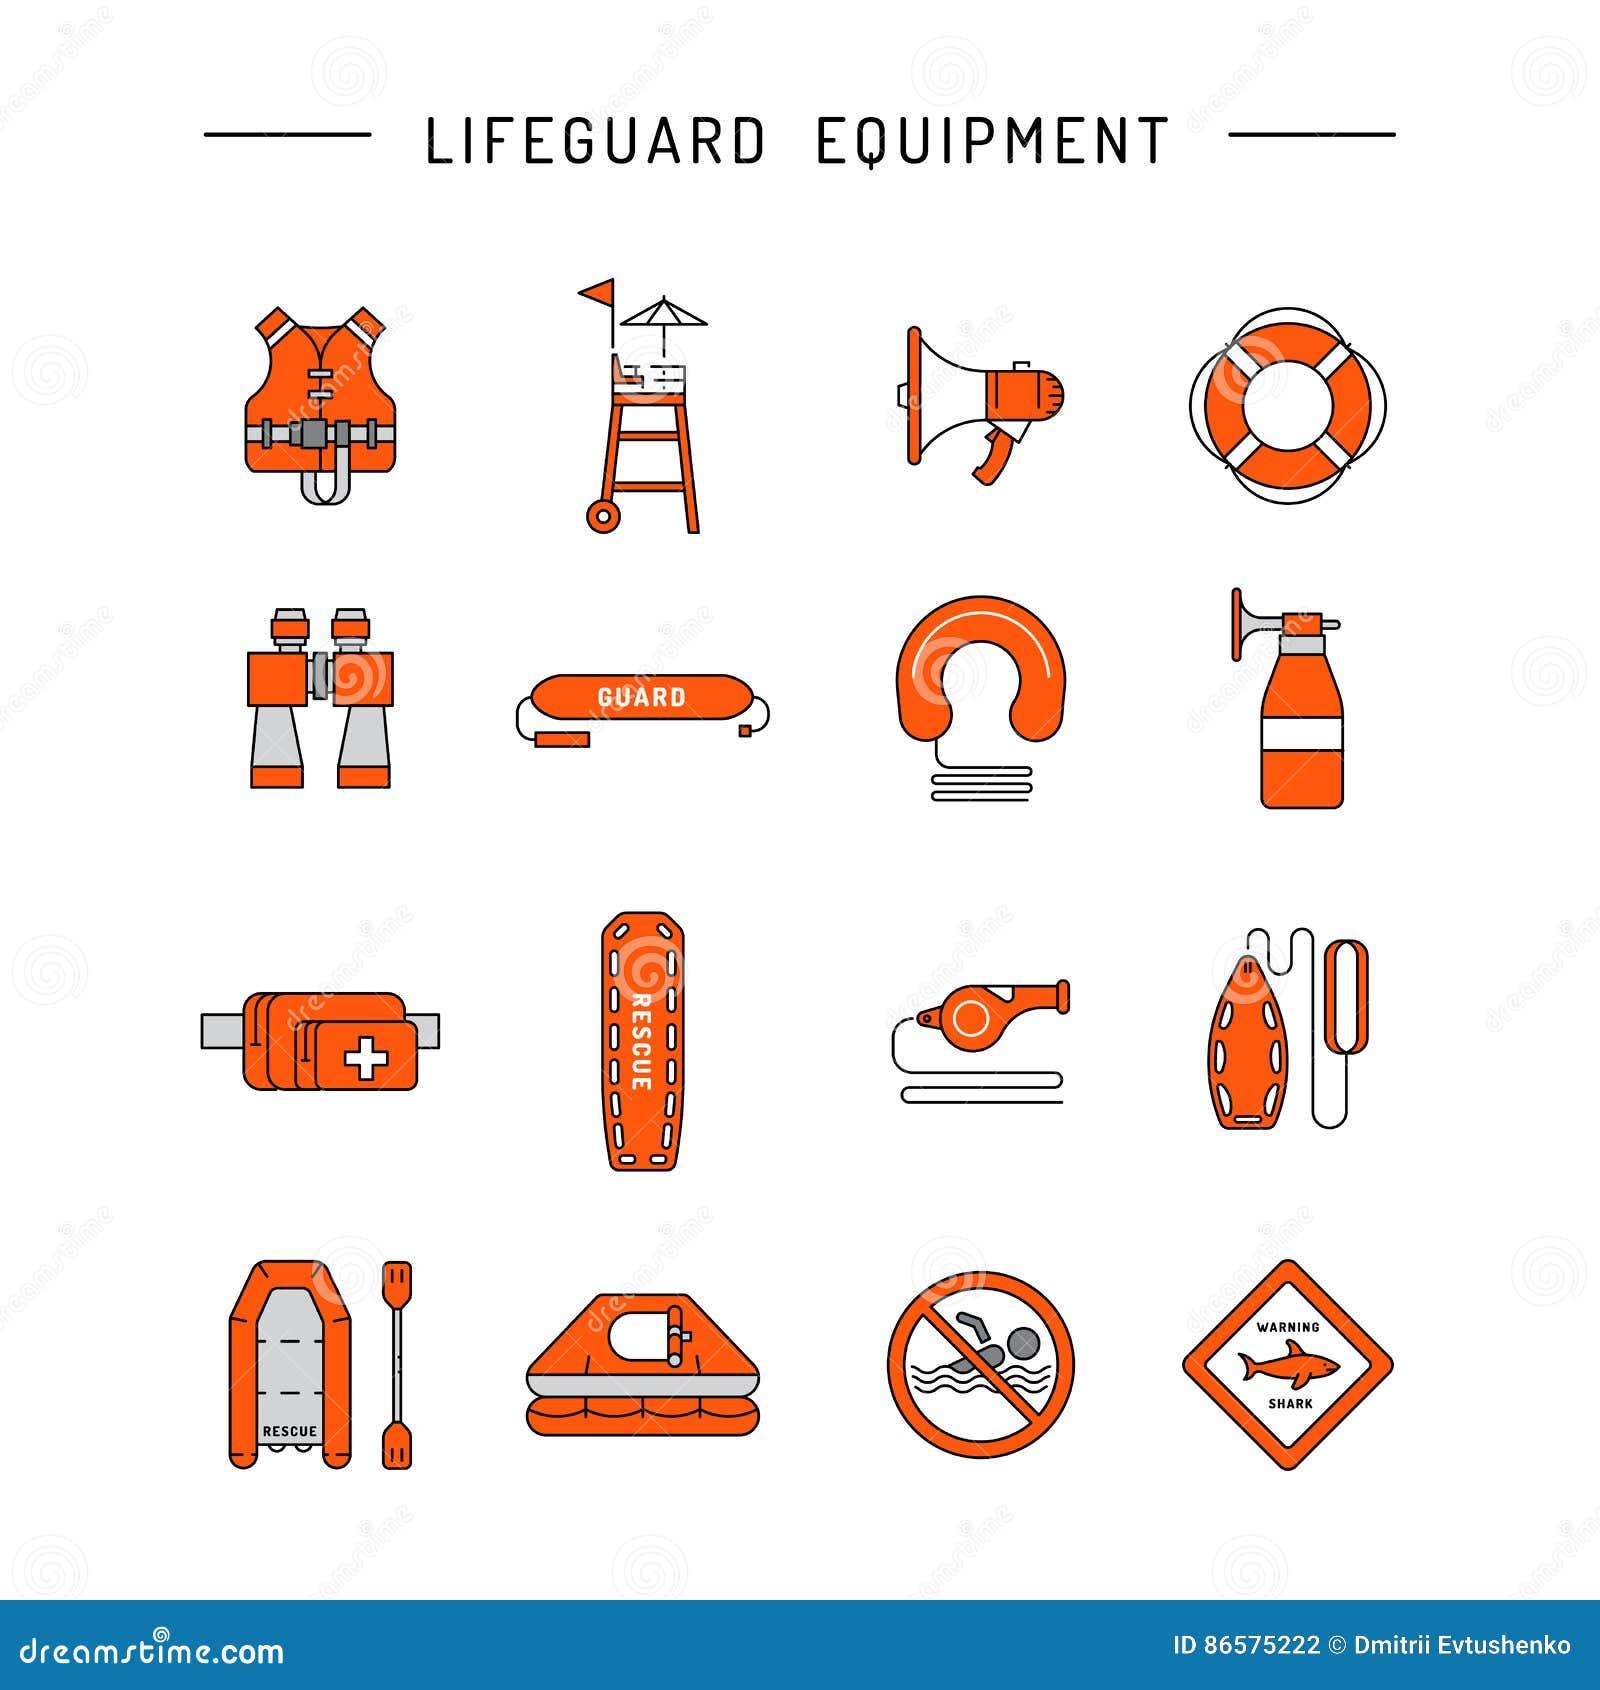 Lifeguard Cartoons Illustrations Amp Vector Stock Images